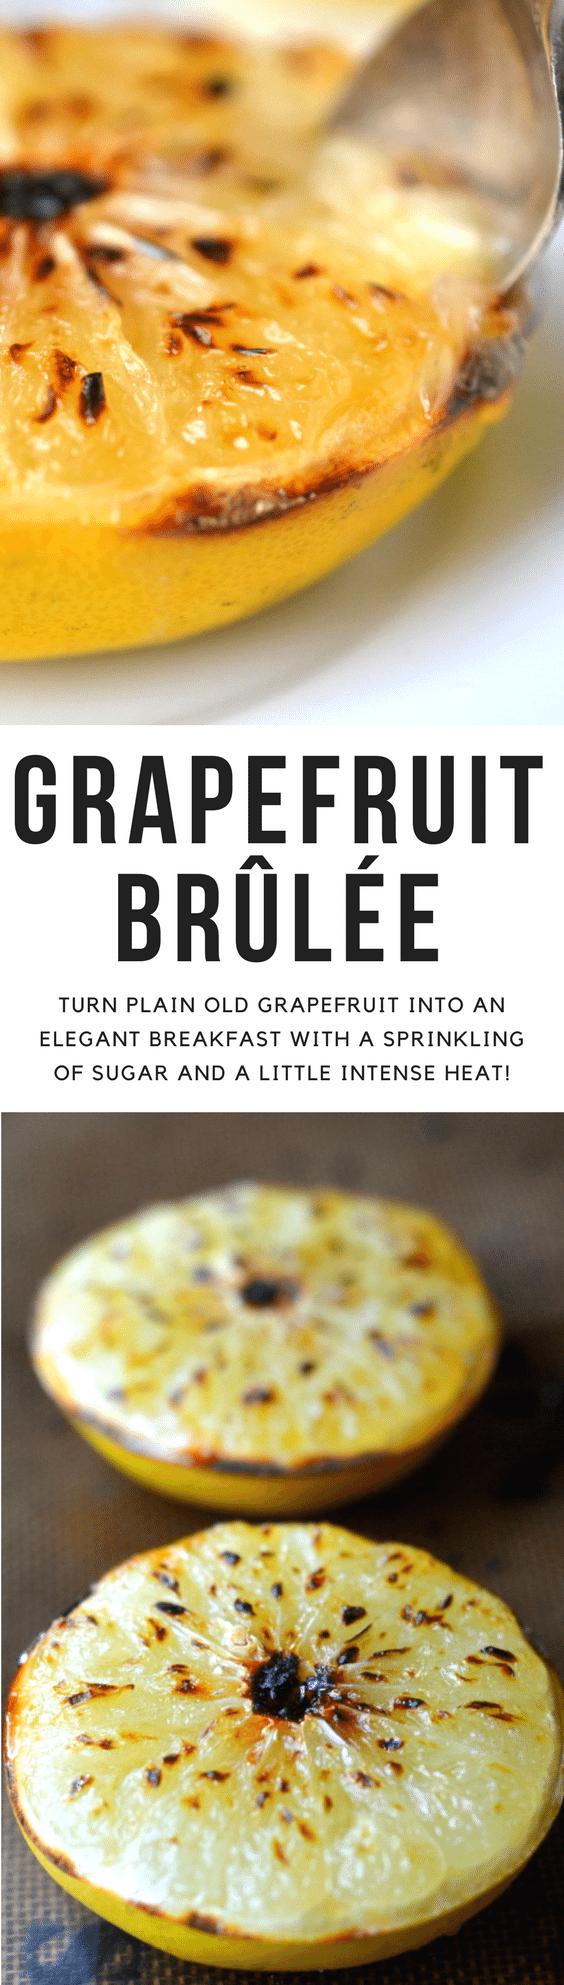 Grapefruit Brûlée ~ turn plain old grapefruit into an elegant breakfast with a sprinkling of sugar and a little intense heat! #grapefruit #breakfast #citrus #broiledgrapefruit #whitegrapefruit #fruit